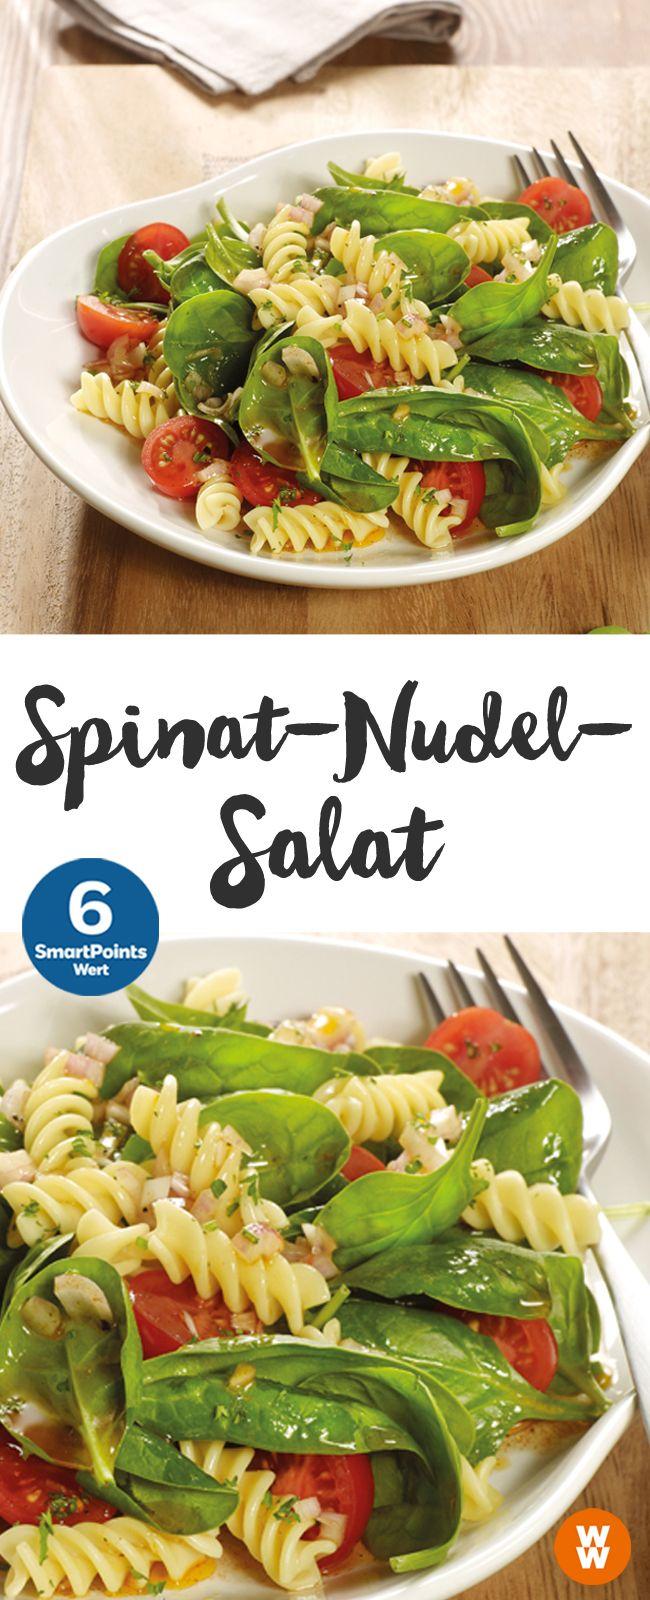 Spinat-Nudel-SalatCornelia Baackmeyer